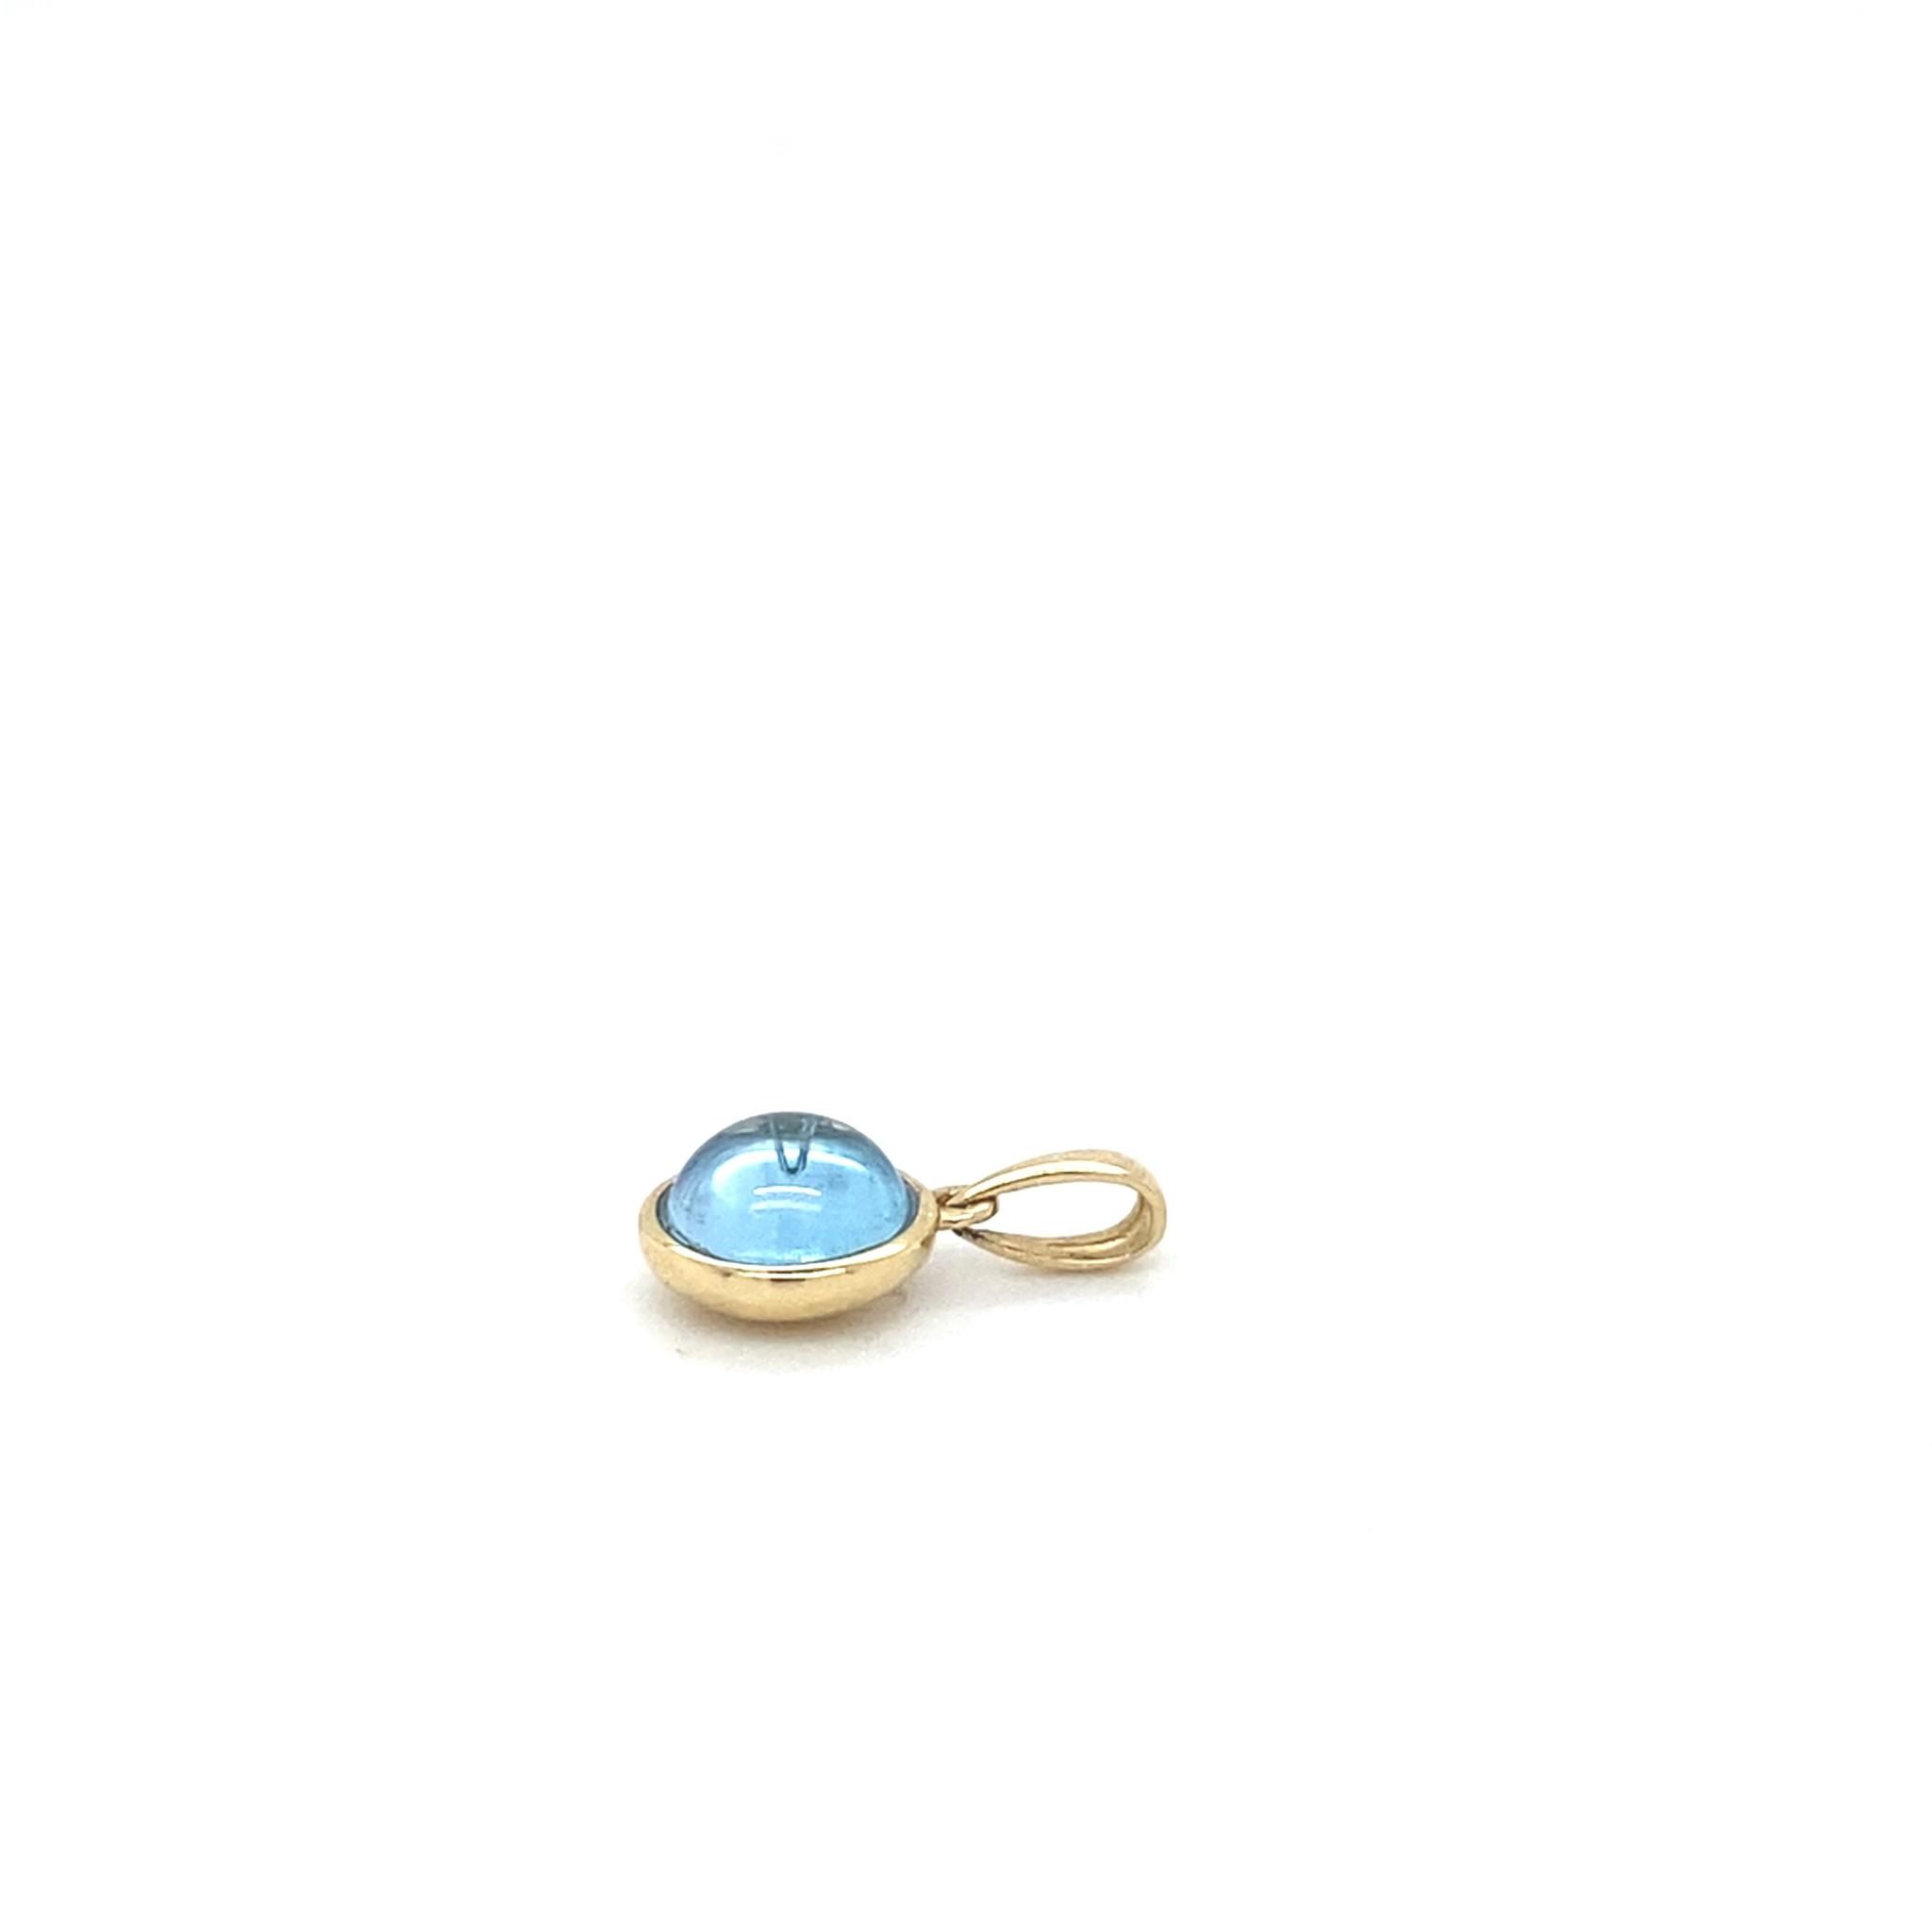 Passione Geelgouden hanger met blauwe topaas 1.59ct